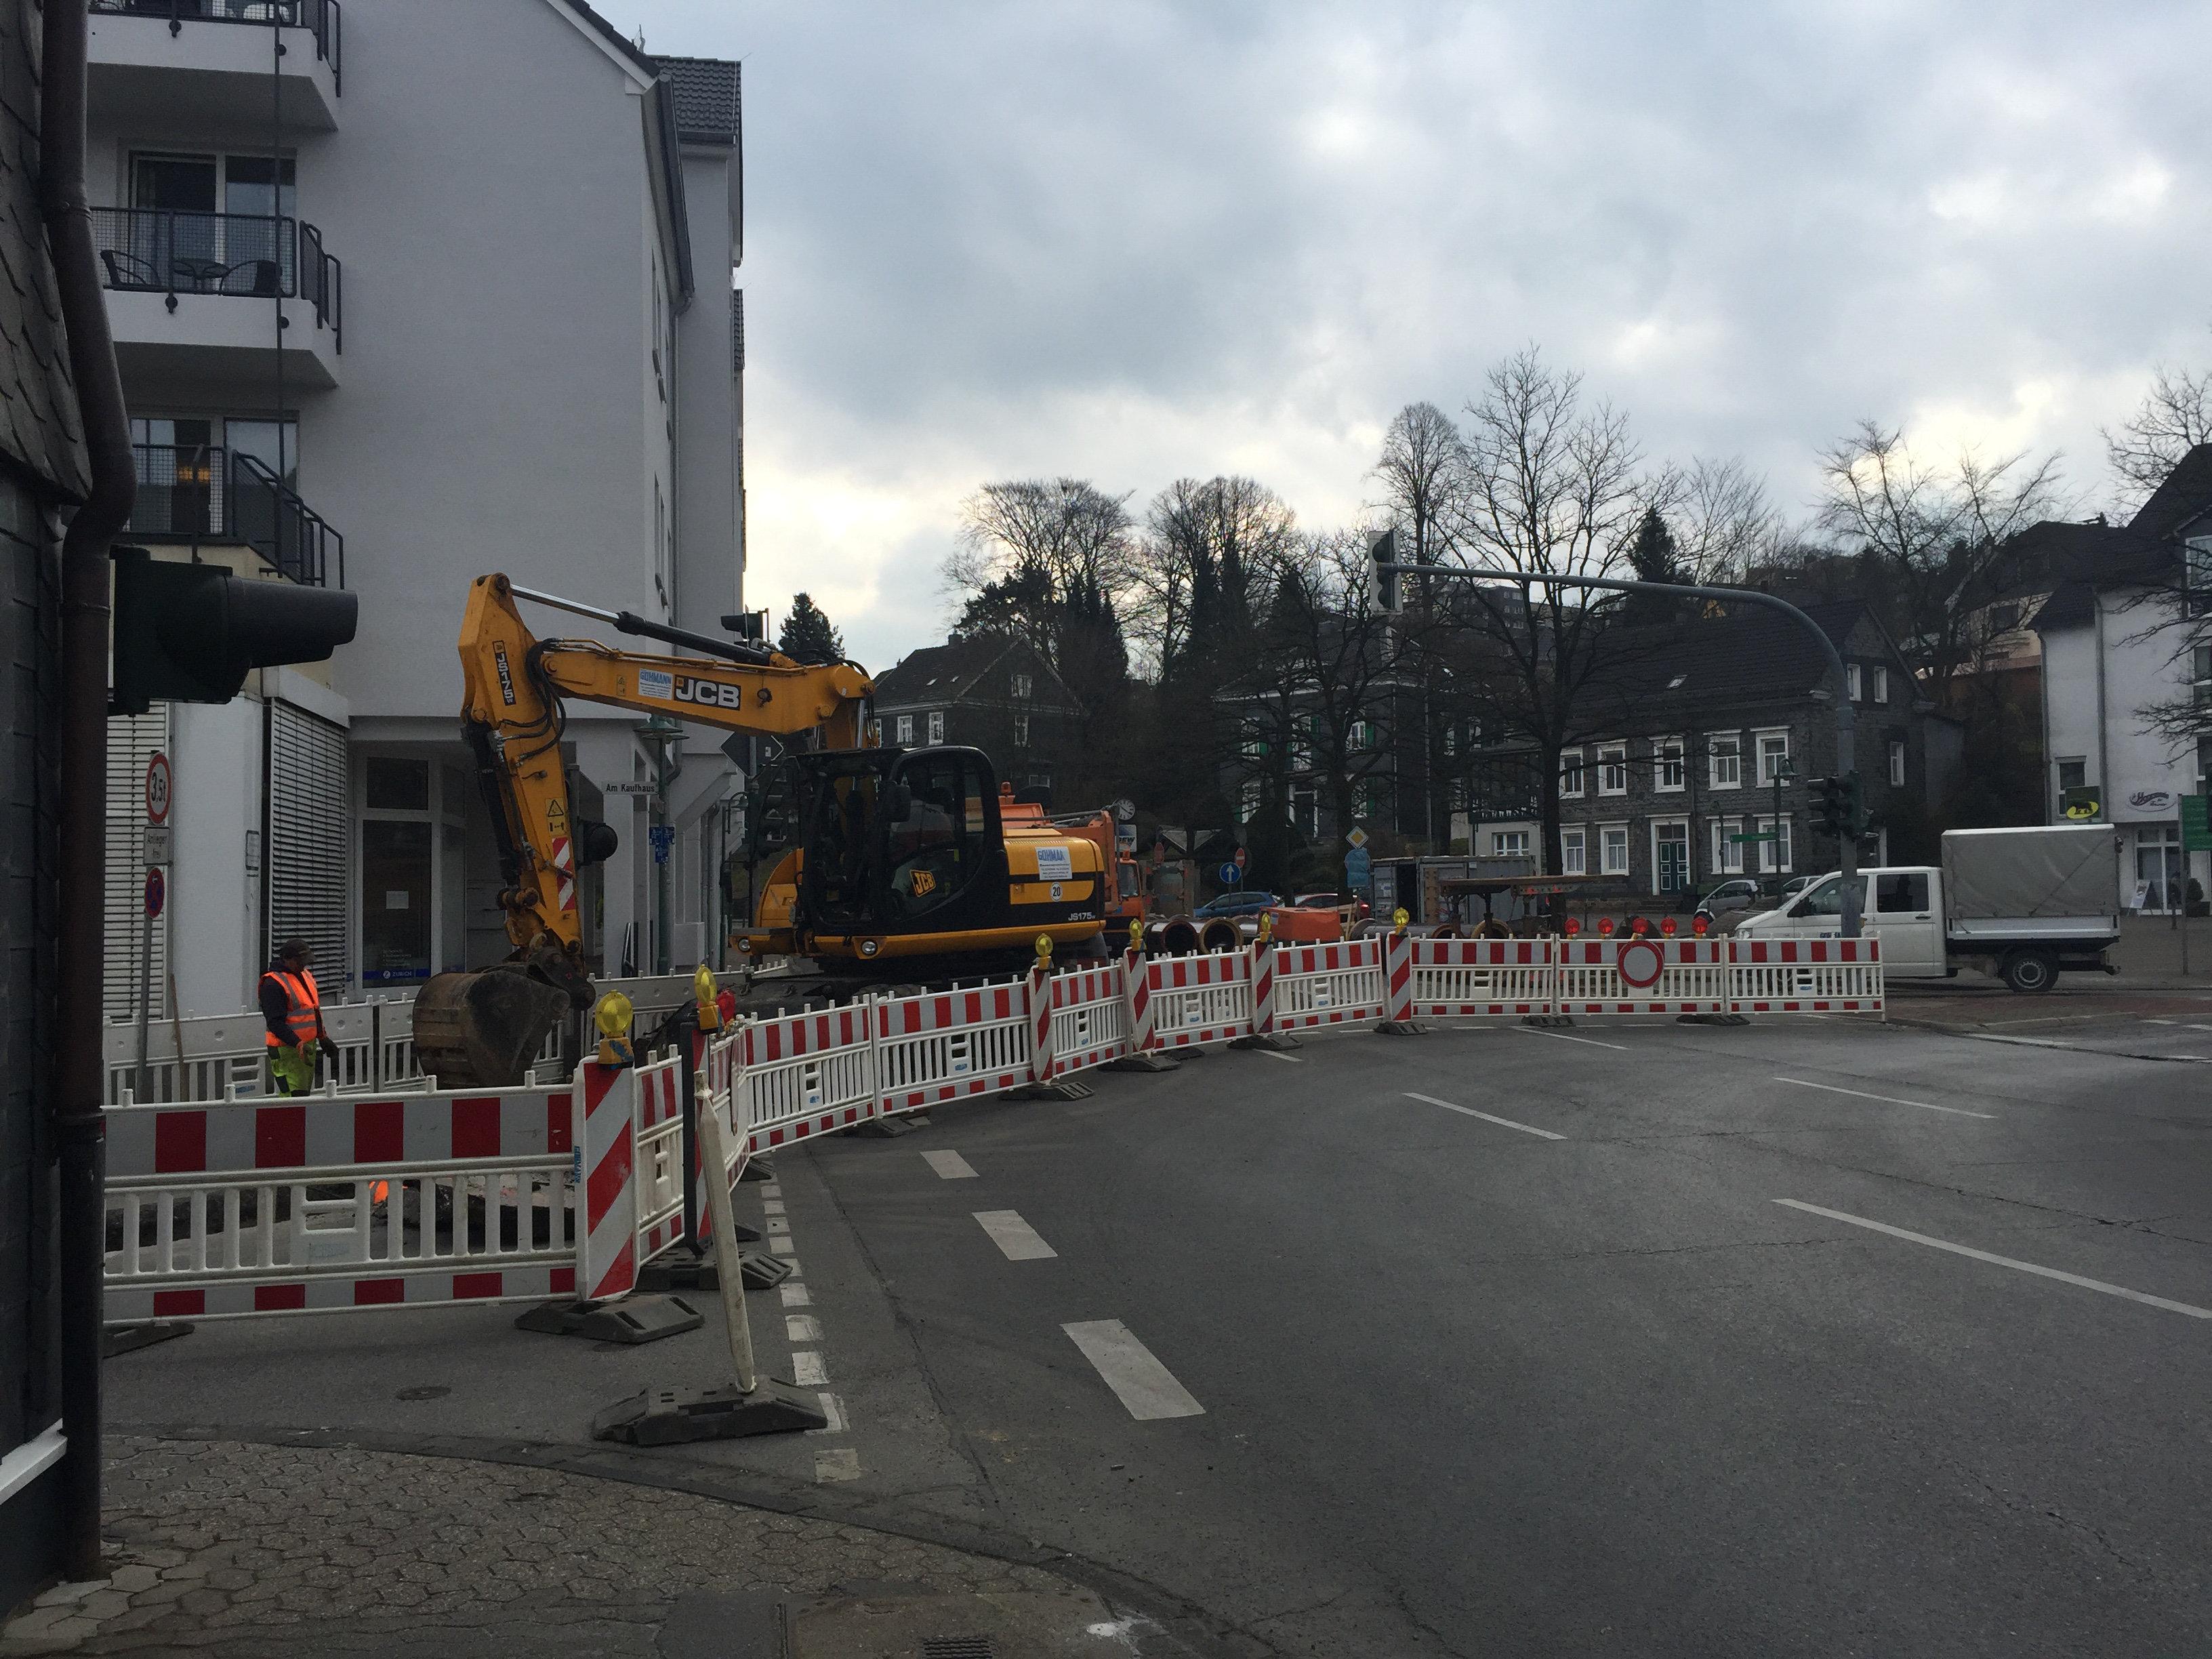 Baustelle am Kölner-Tor-Platz Richtung Hochstraße